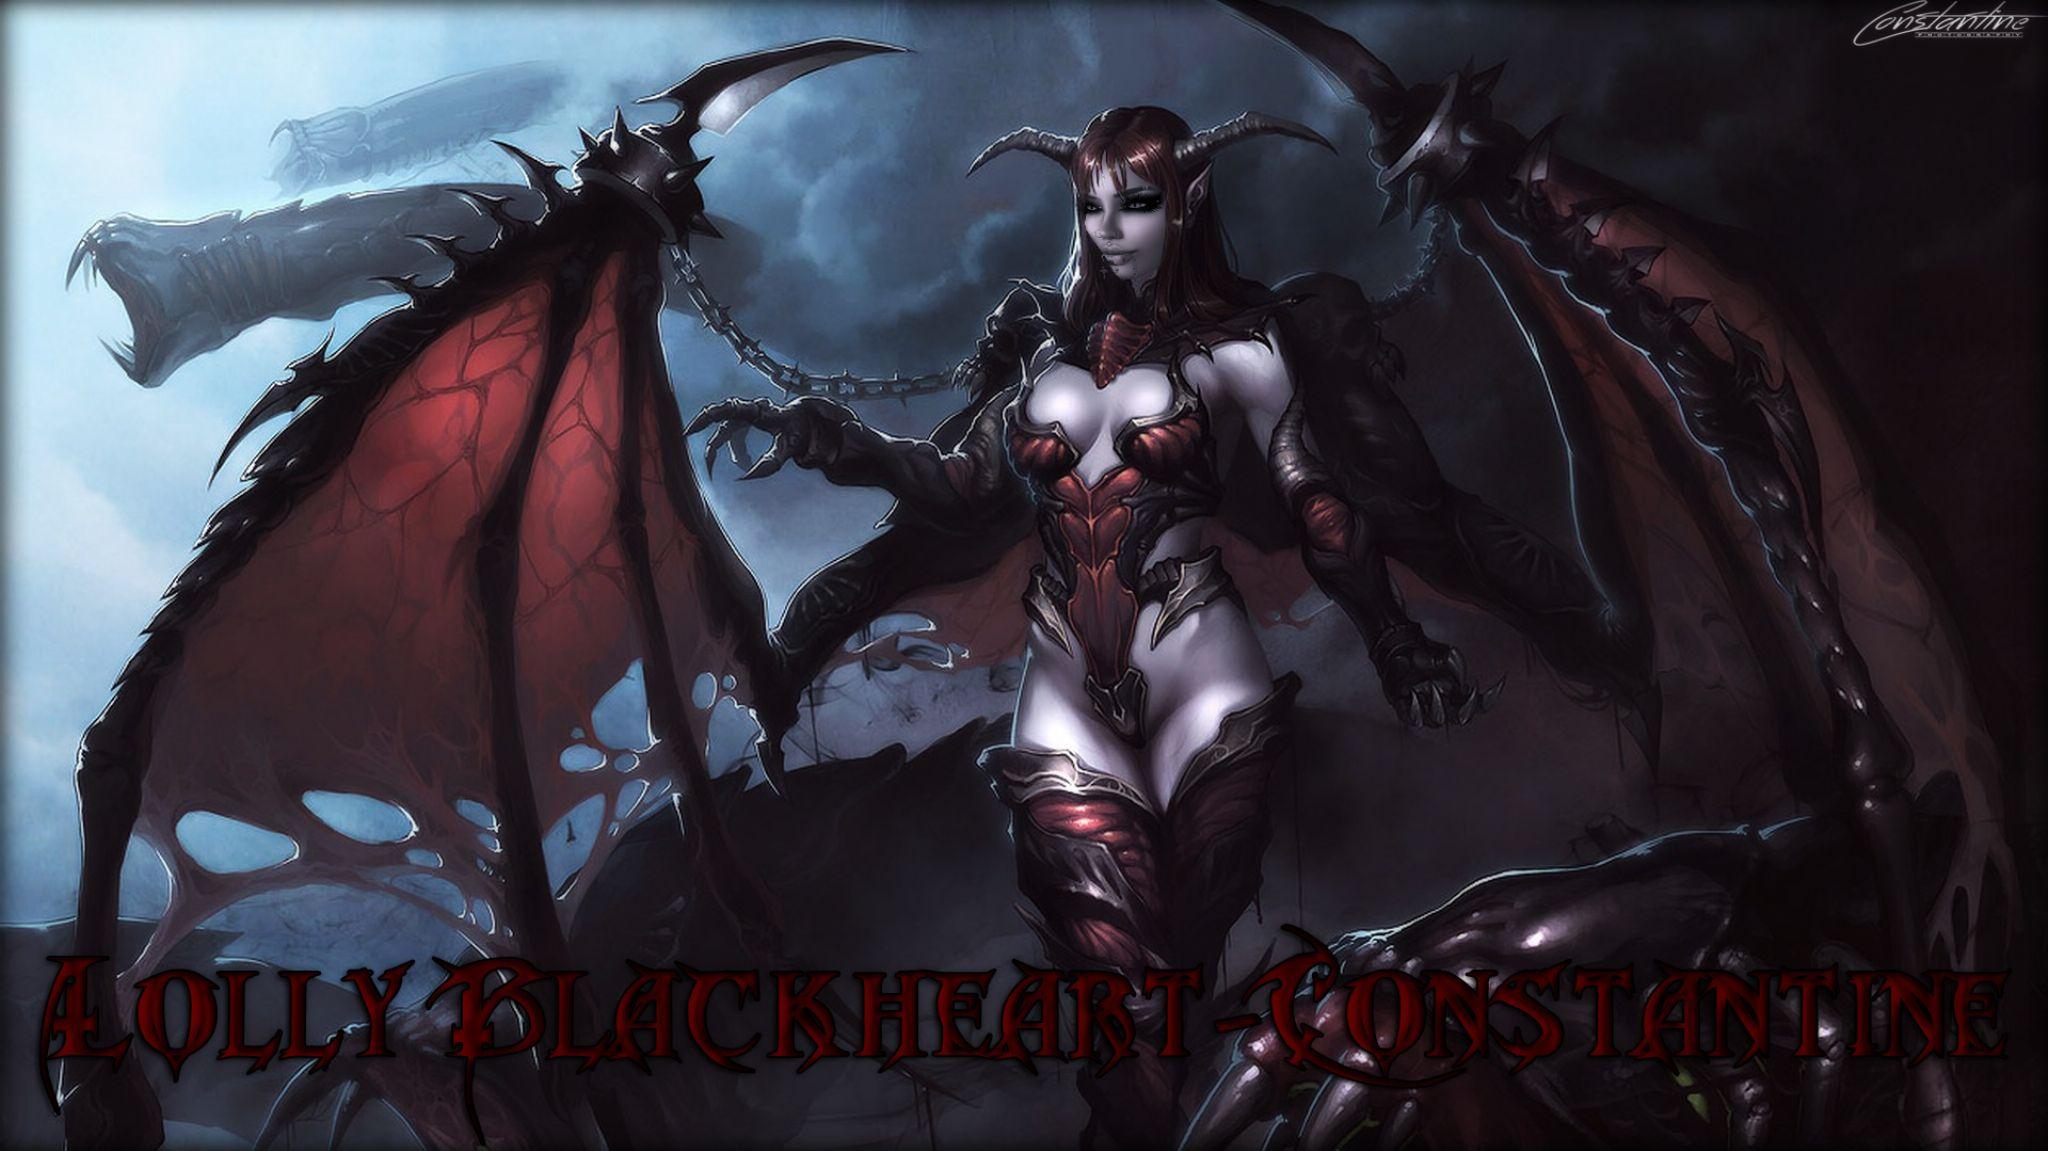 Lolly Dark Demonic by Wrath Constantine